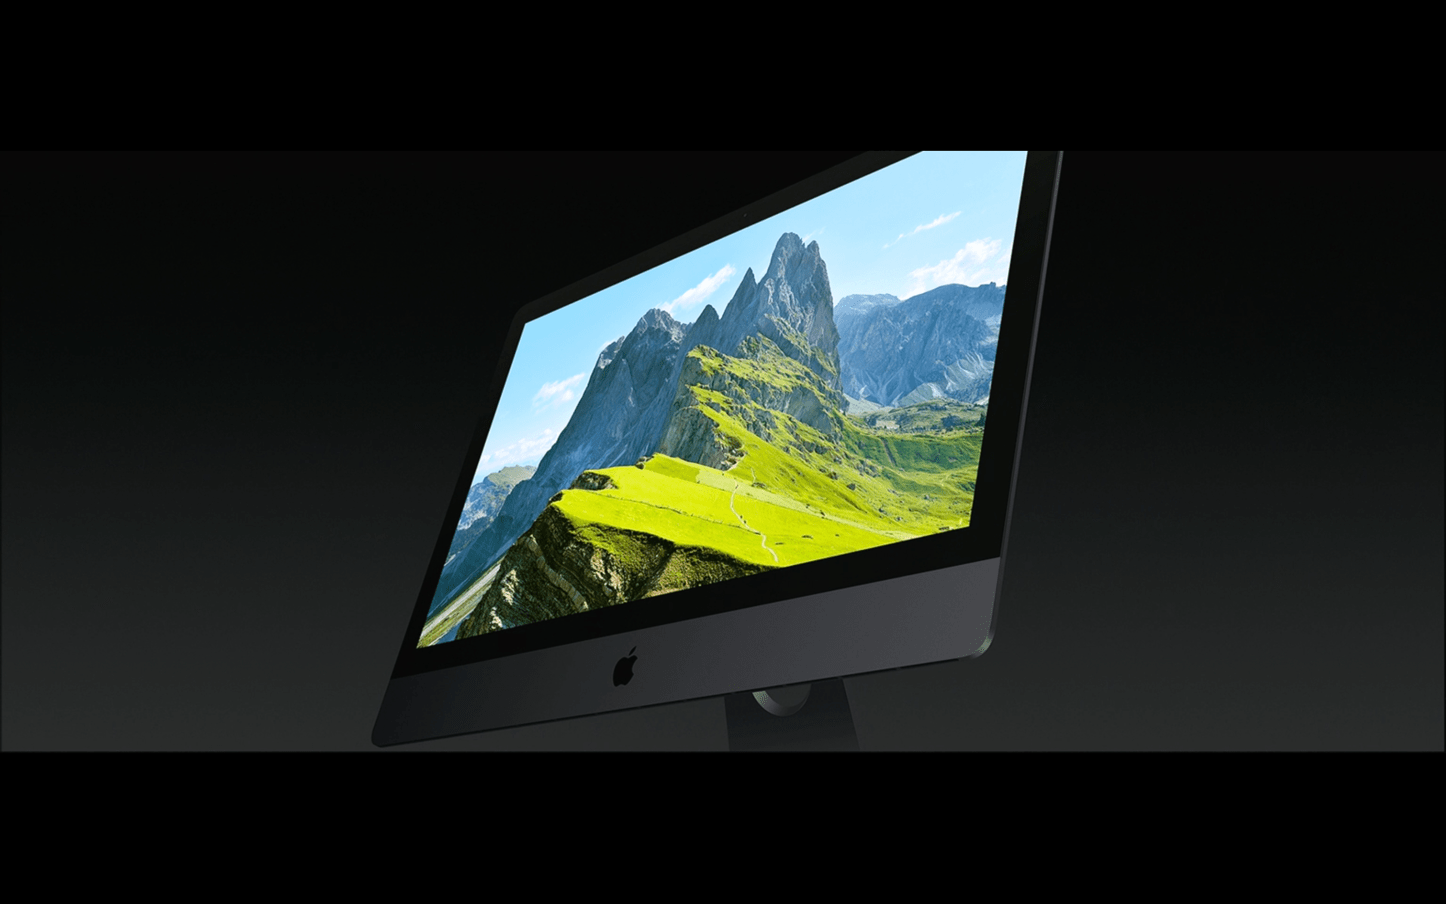 iMac-Pro-2017-WWDC17-07.png